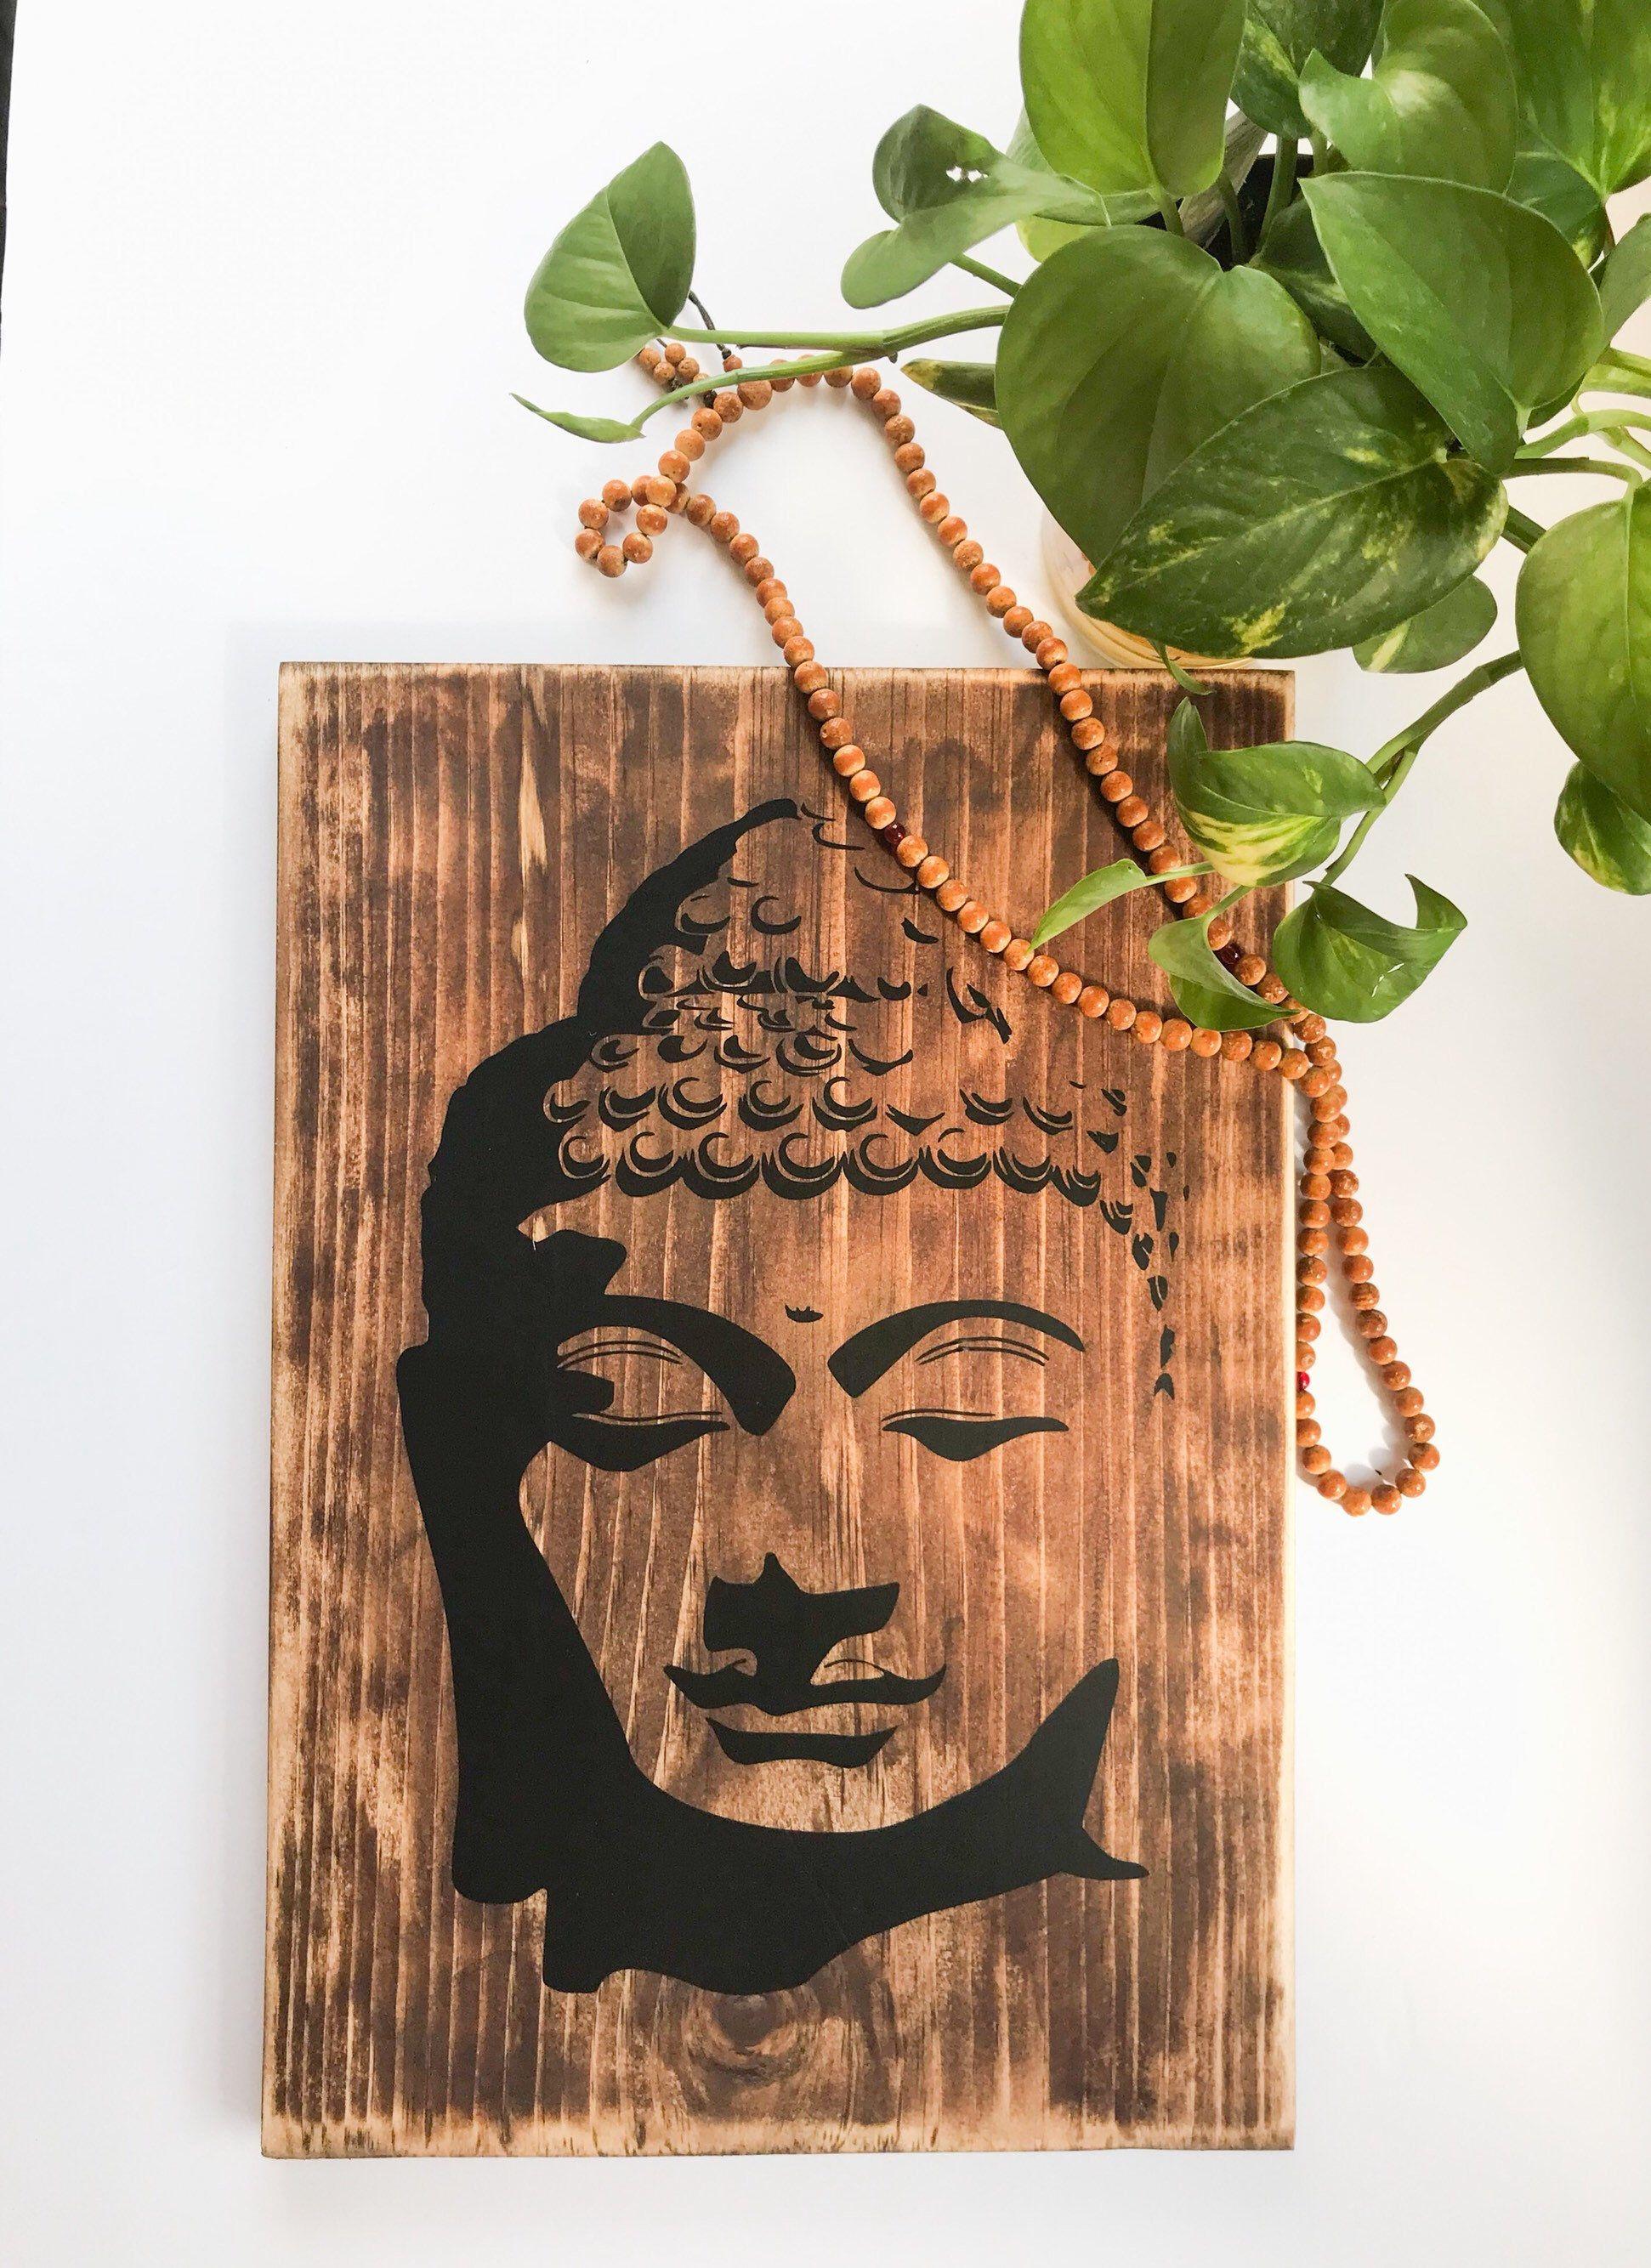 Rustic Wood Buddha Wall Art Wooden Buddha Face Home Decor